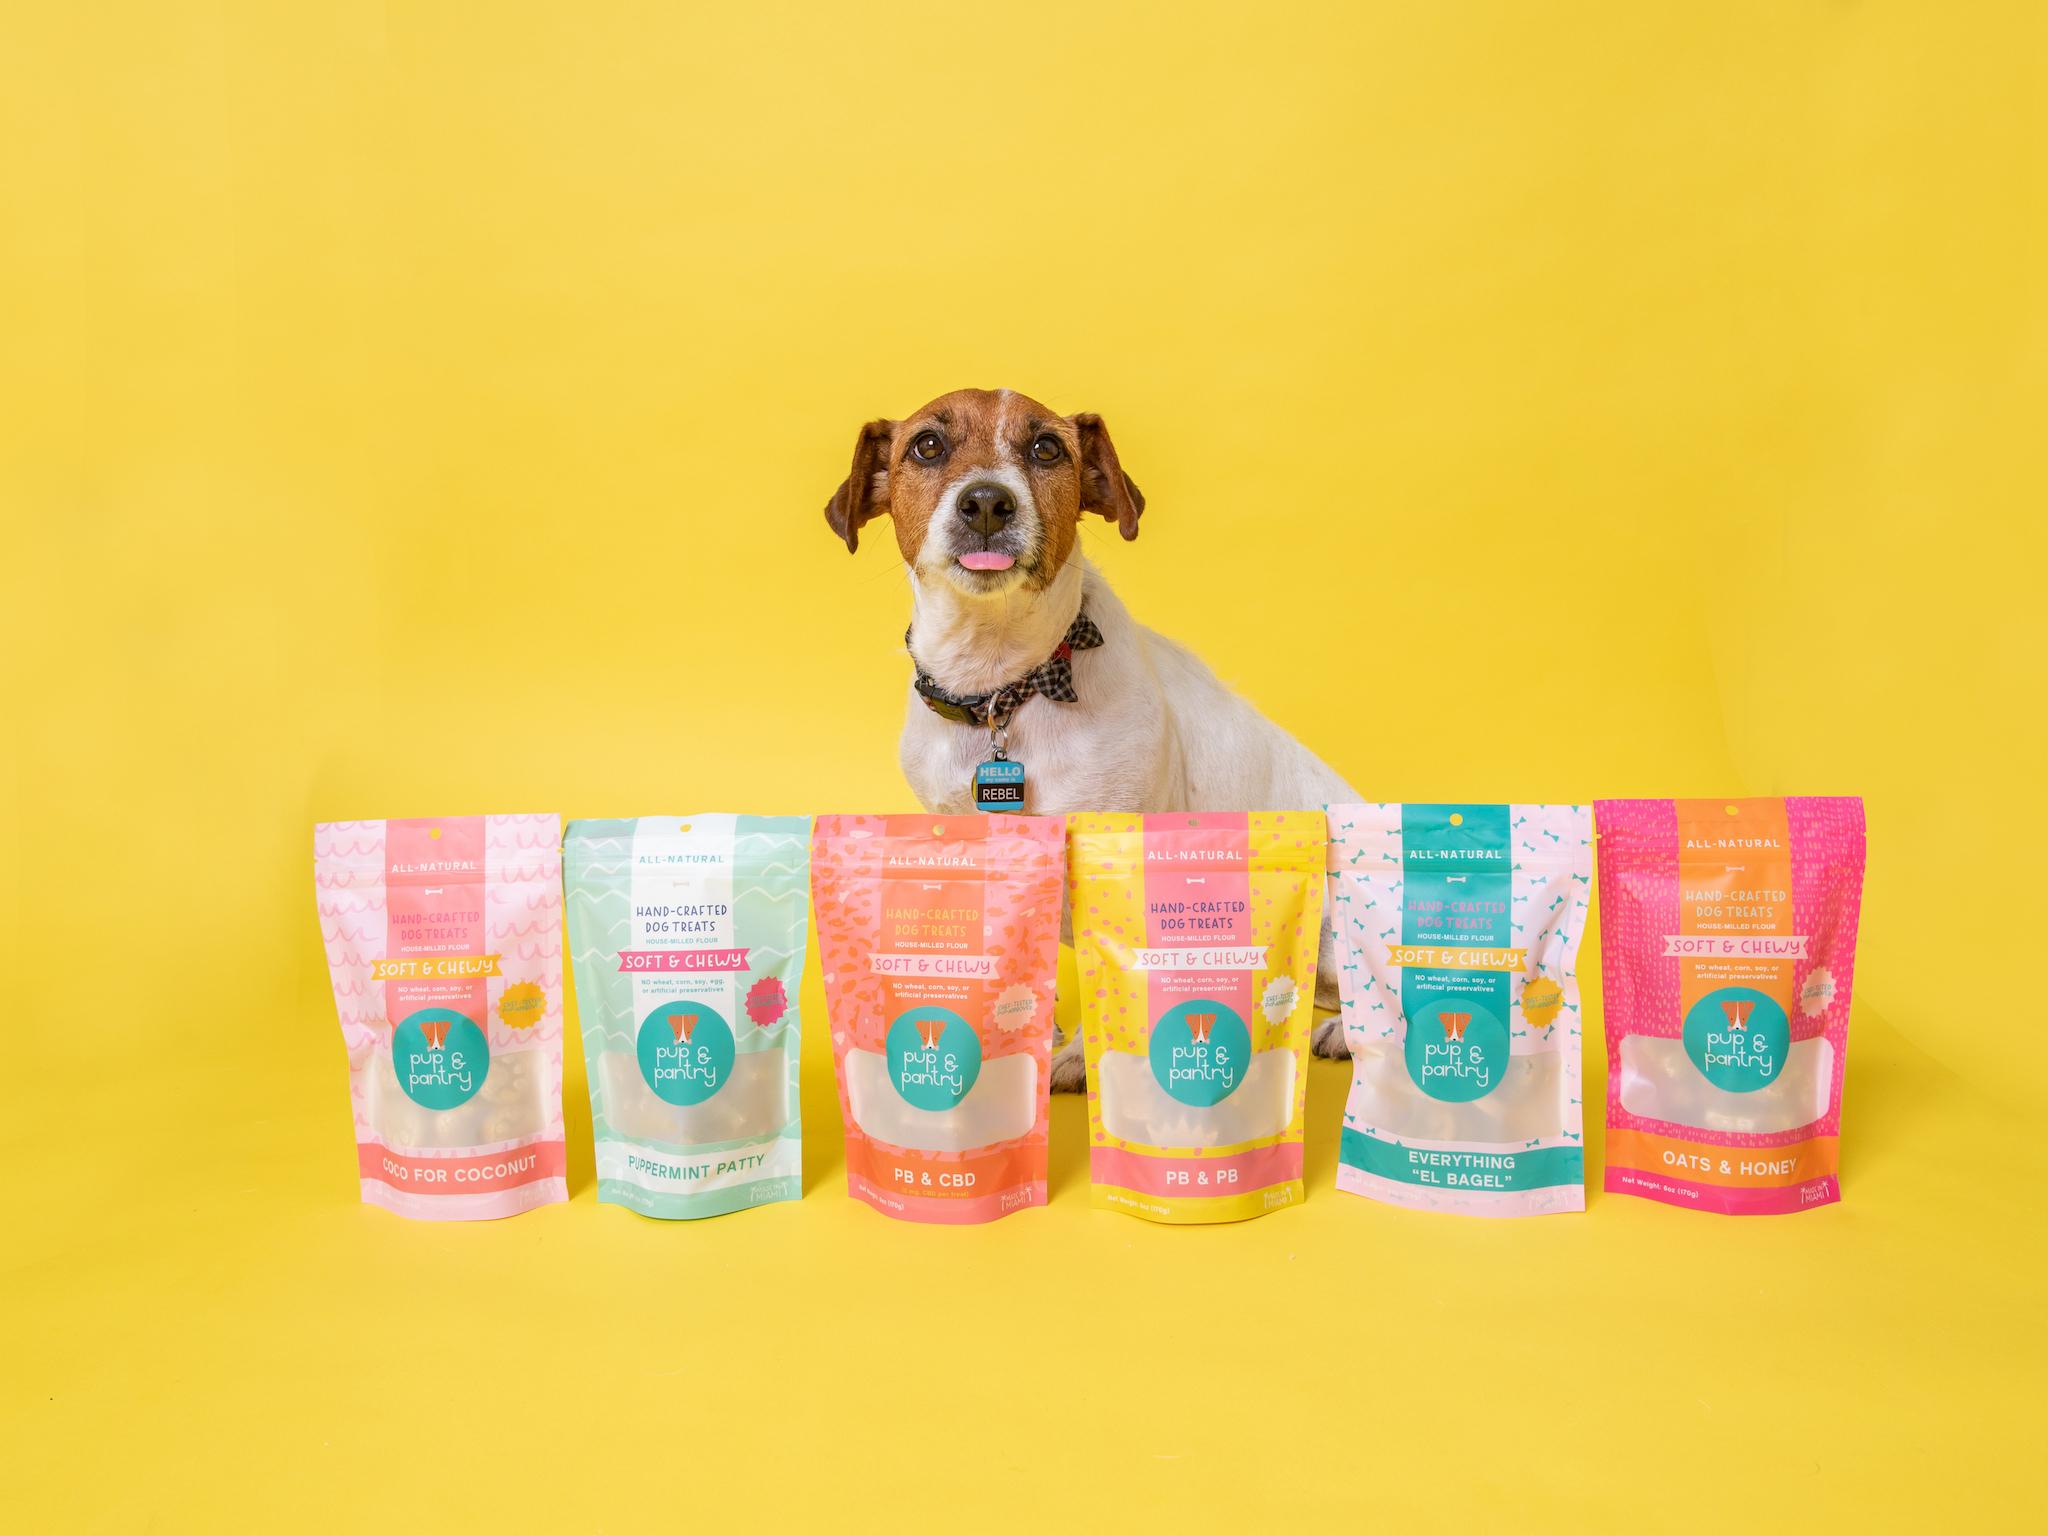 Pup & Pantry